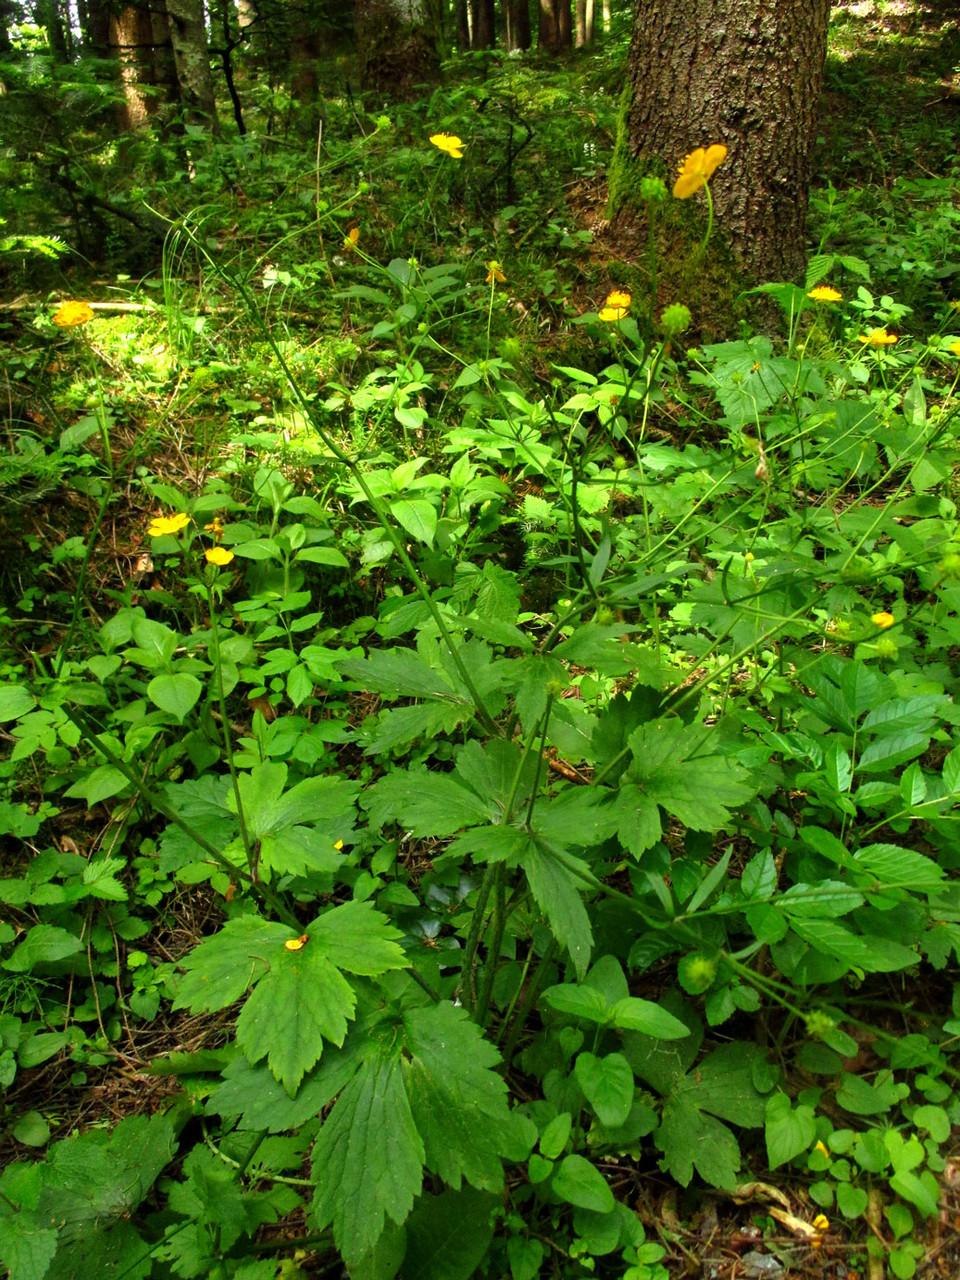 Woll-Hahnenfuß (Ranunculus lanuginosus) | HAHNENFUSSGEWÄCHSE (Ranunculaceae) | giftig!